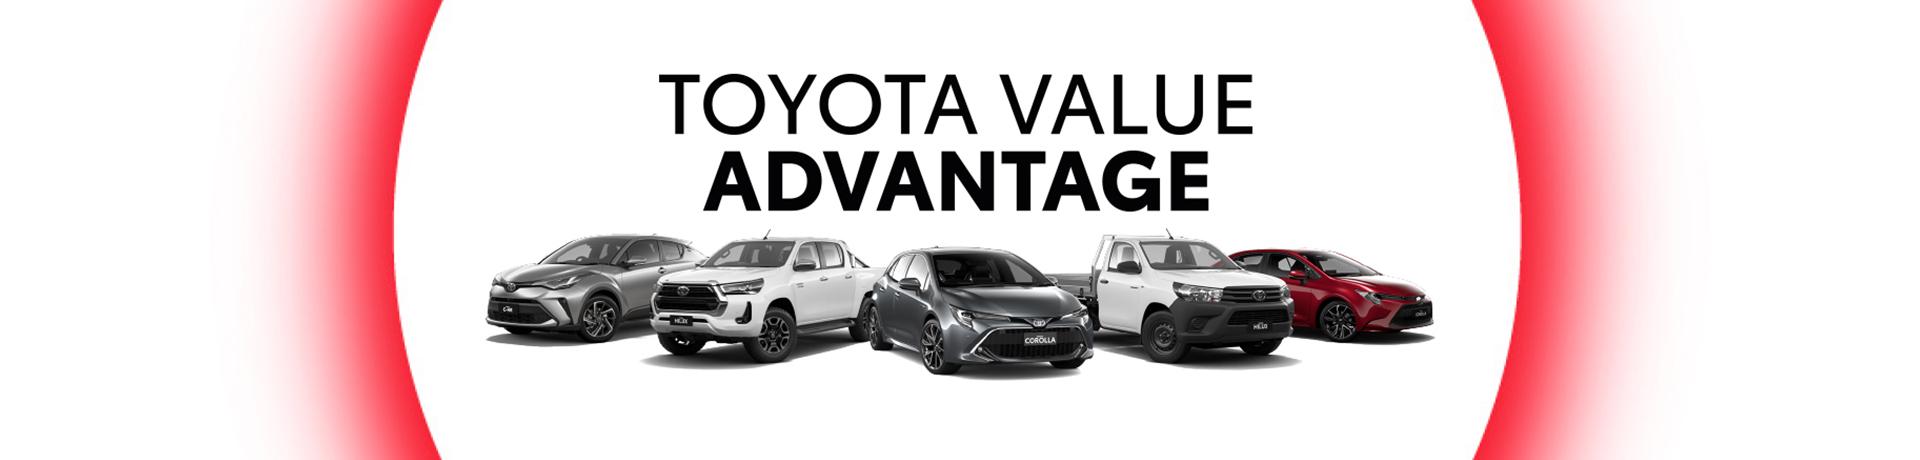 toyota-value-advantage-desktop-banner